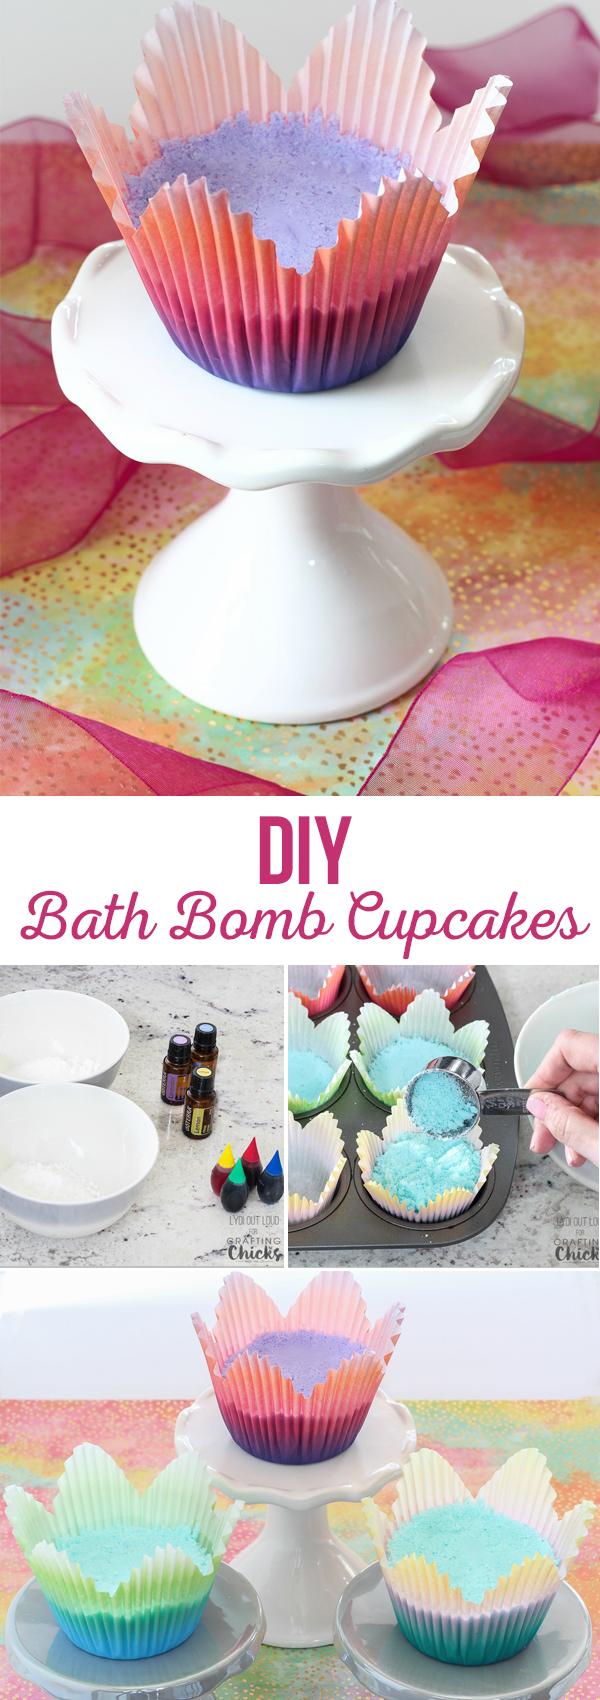 DIY Bath Bomb Cupcakes